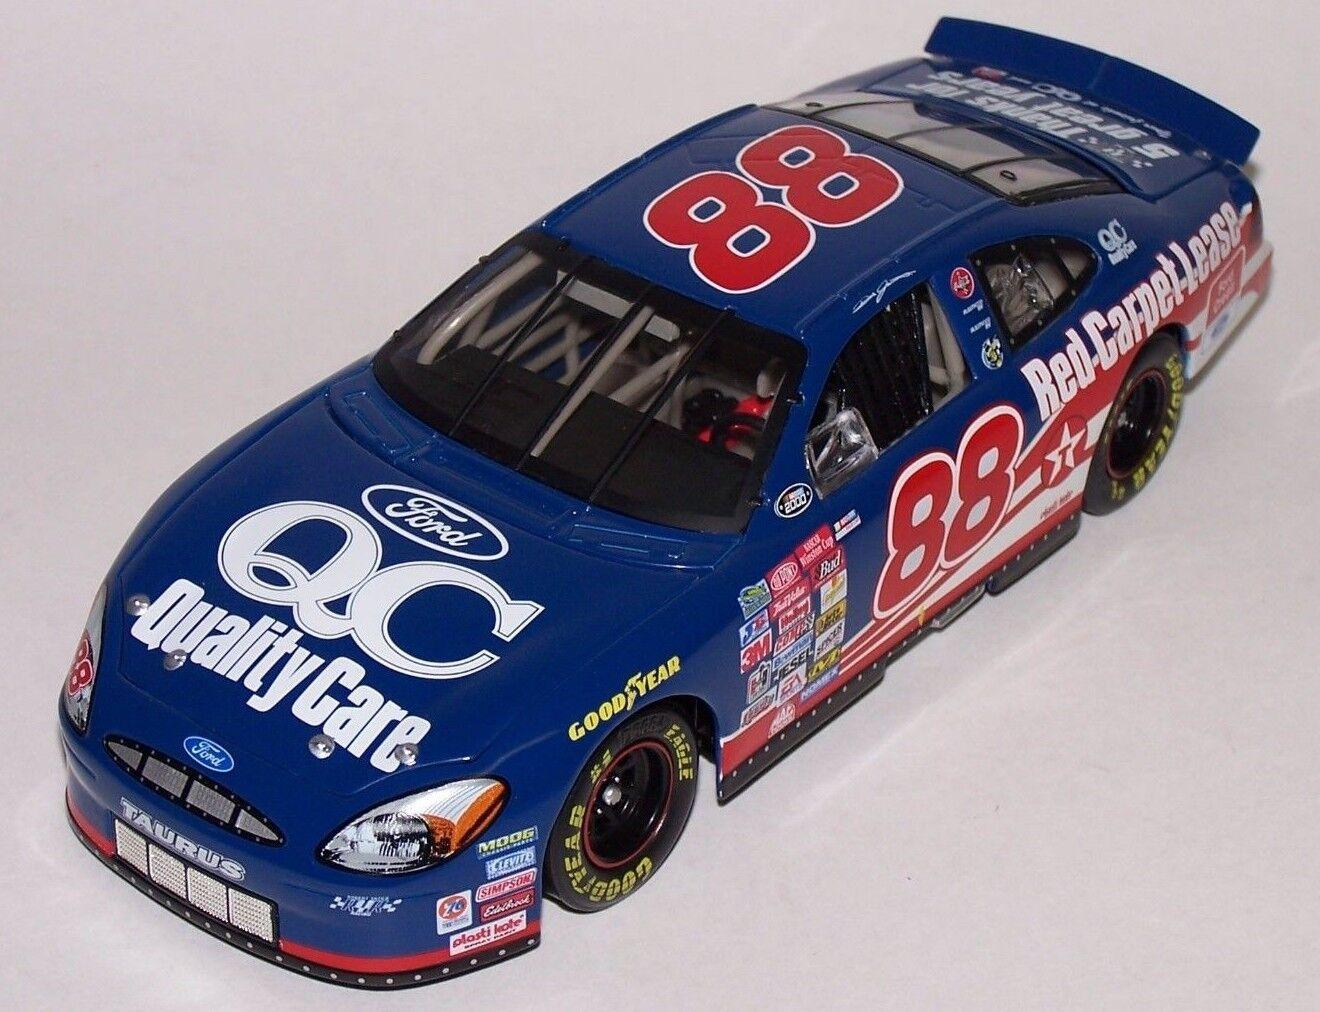 Dale Jarrett 2000 Taurus Last Ride QC 1 24 Acción